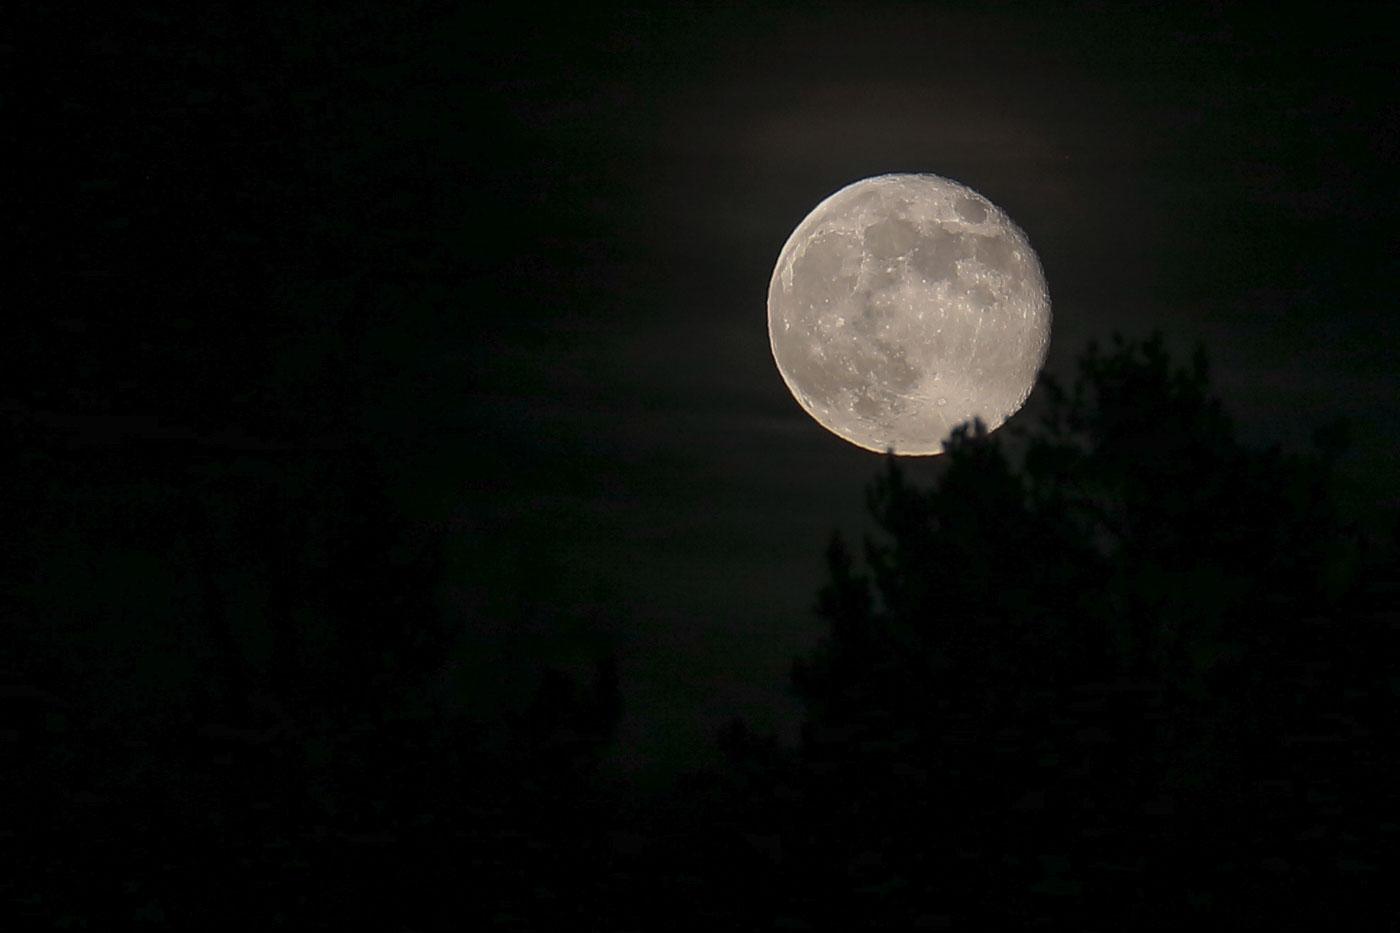 roslagen-moon-april2019-1400-1.jpg